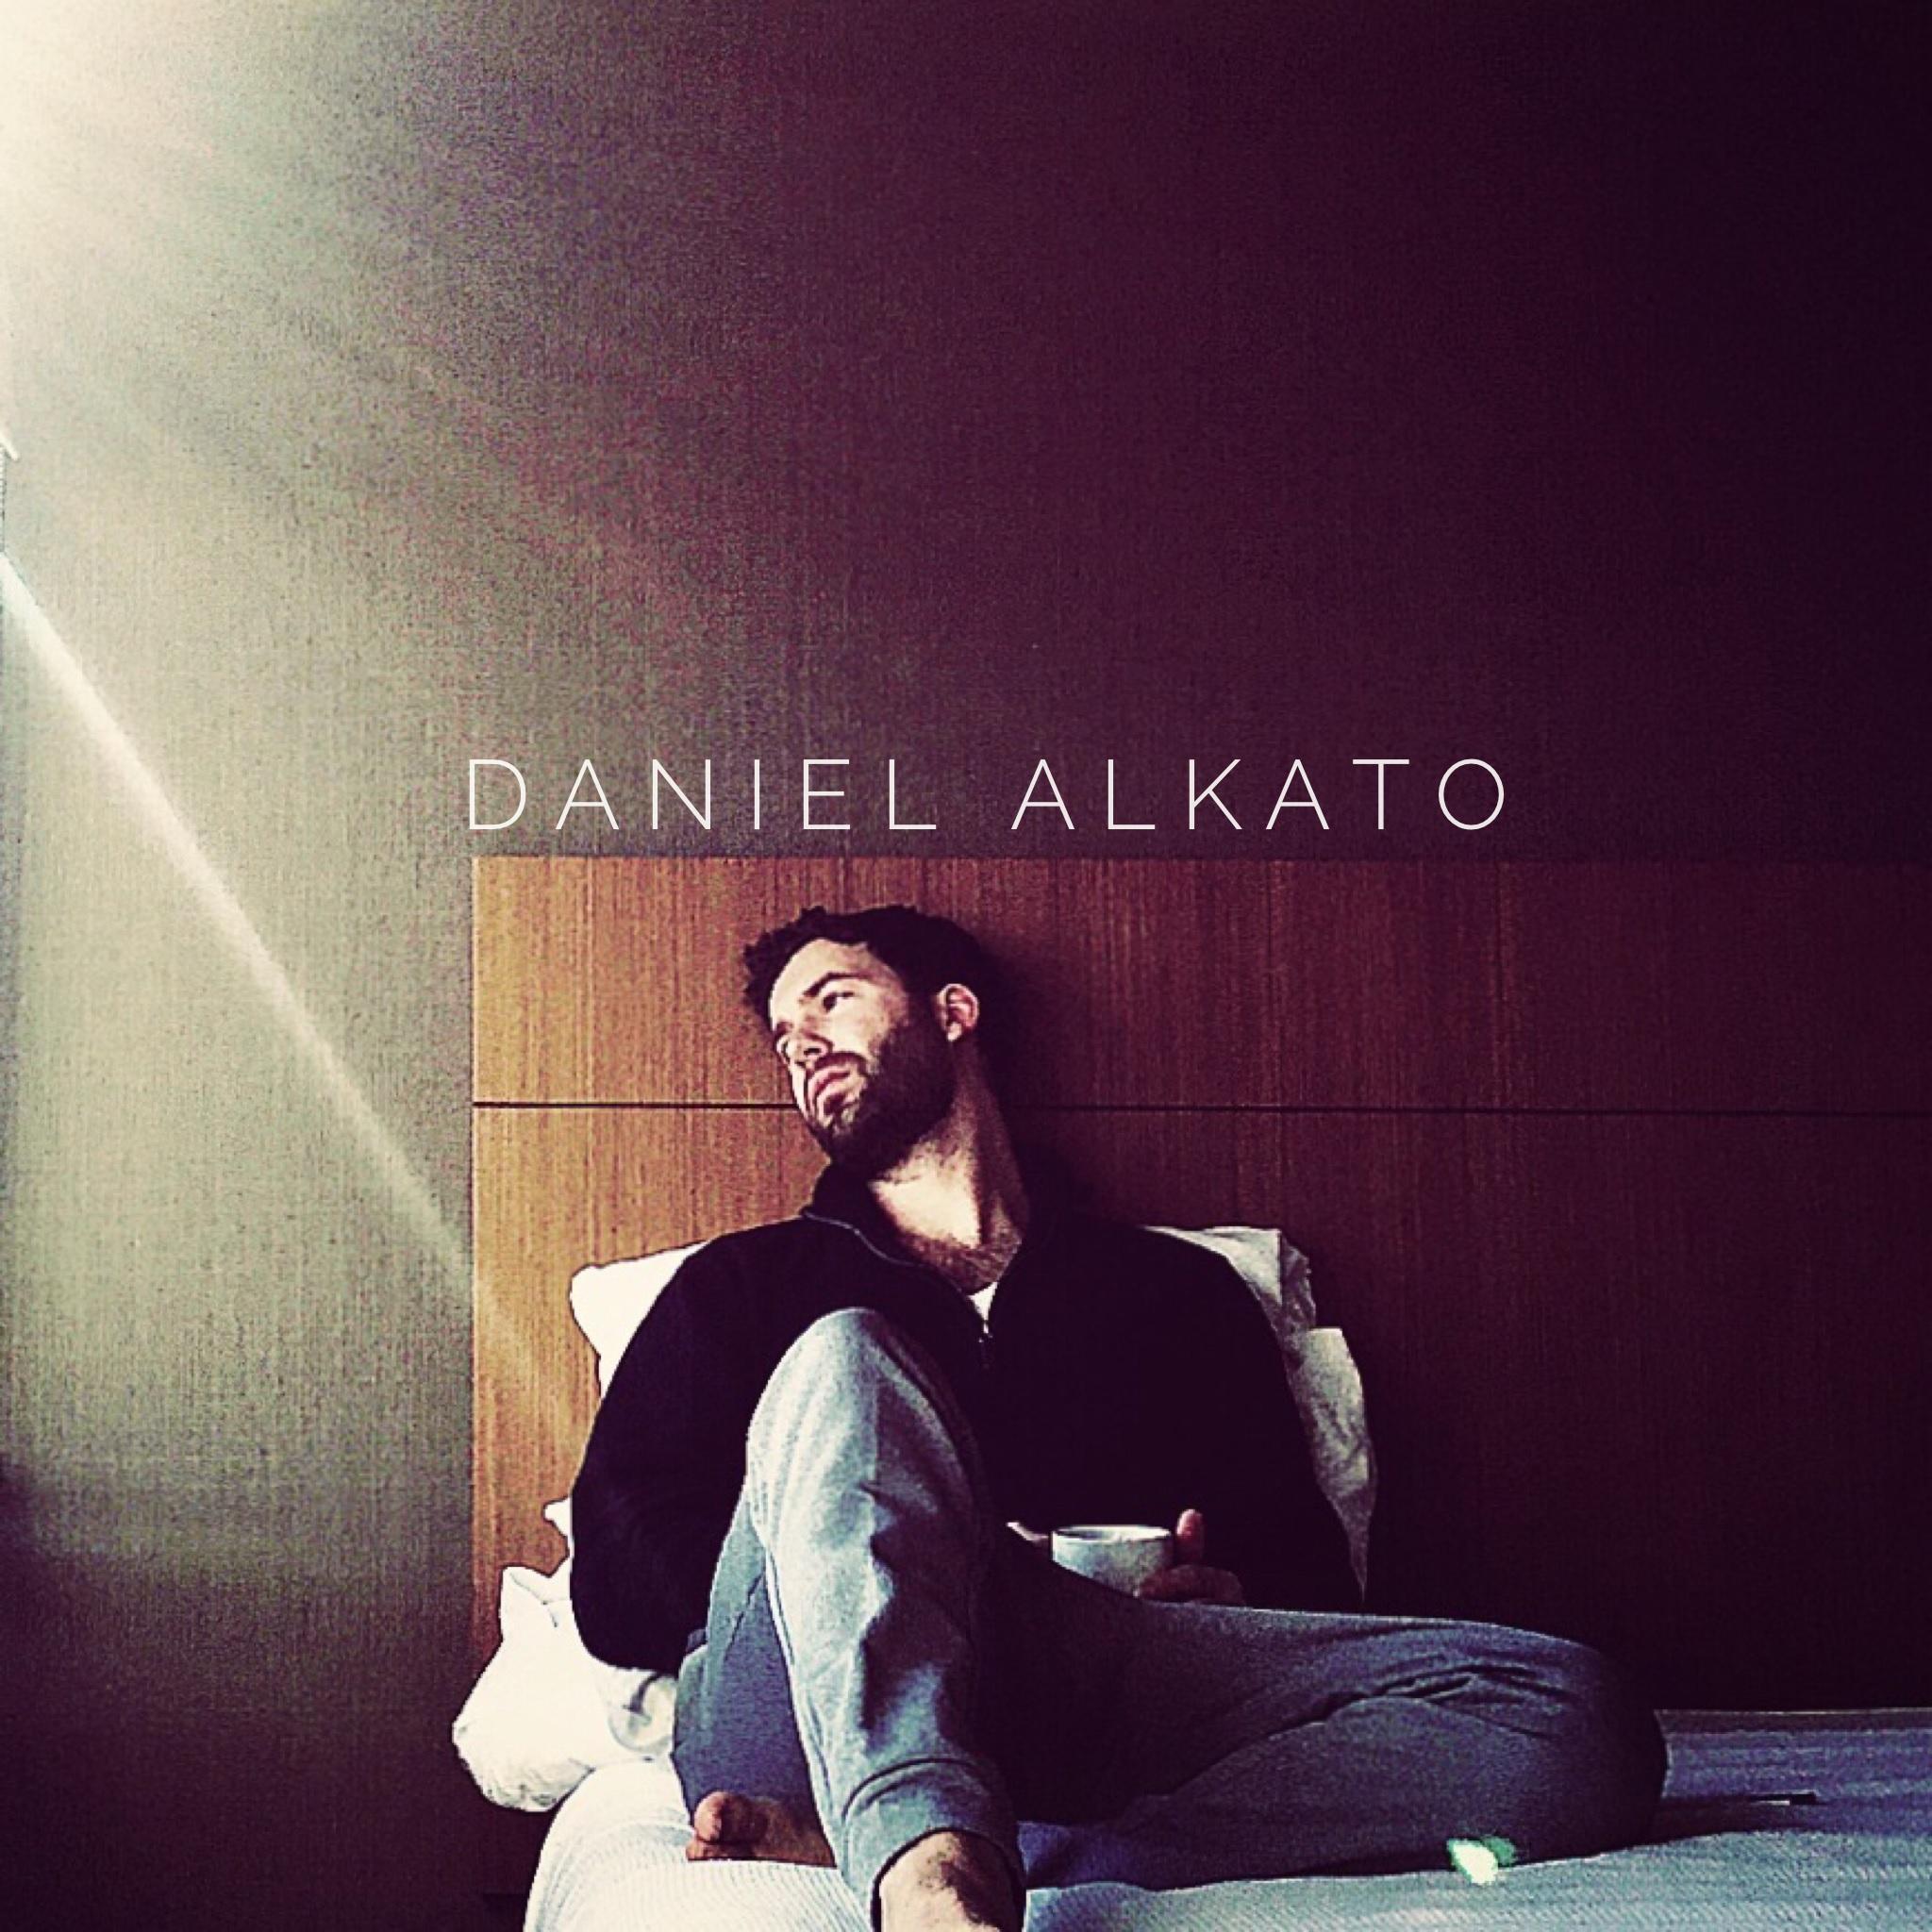 Daniel Alkato - When You Look at Me Album Coer